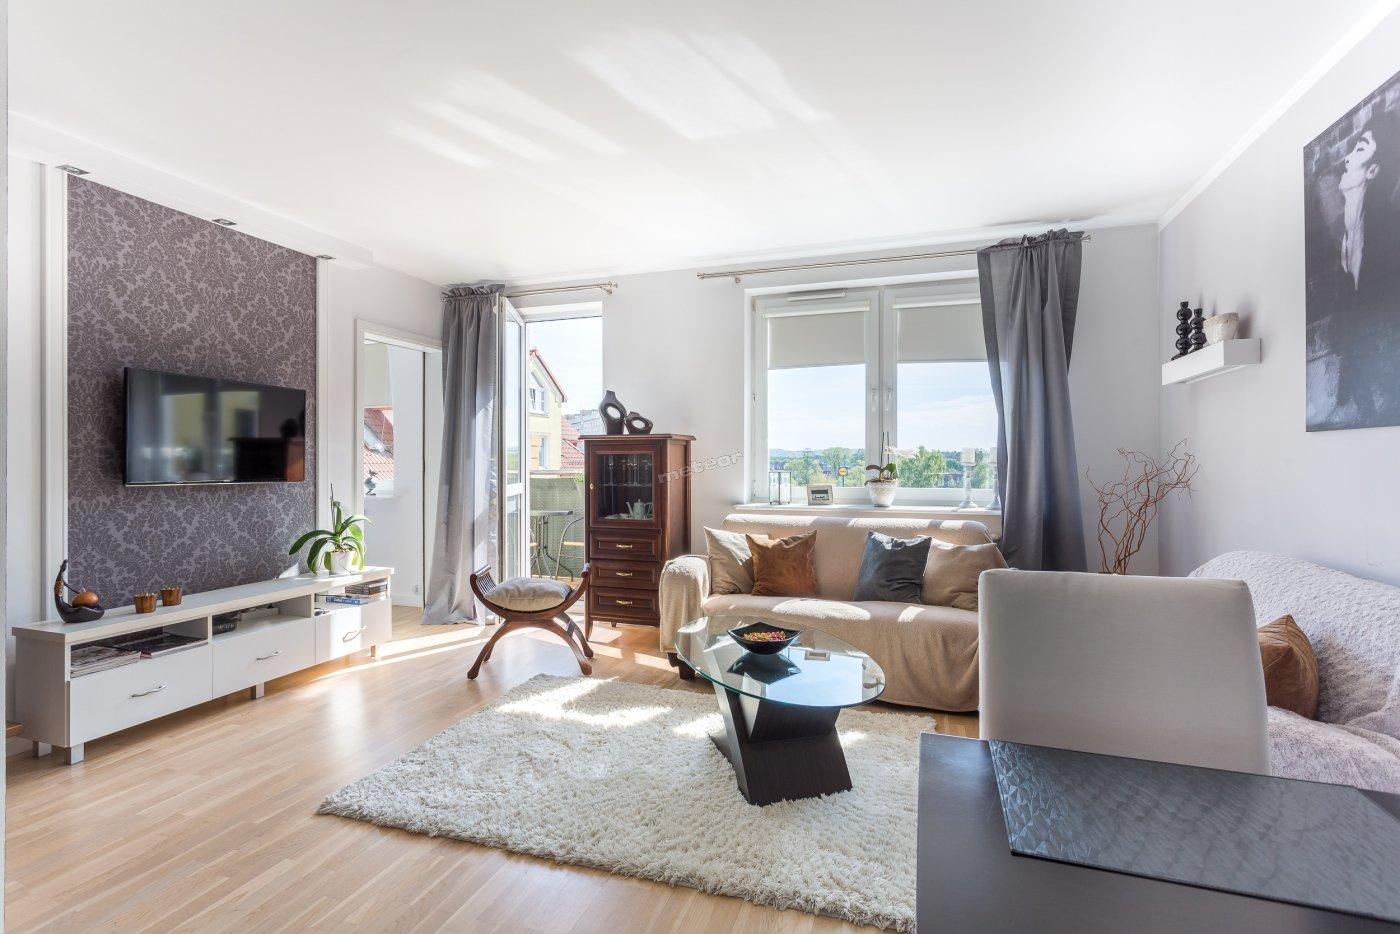 Apartament MOLO 3-pokojowy